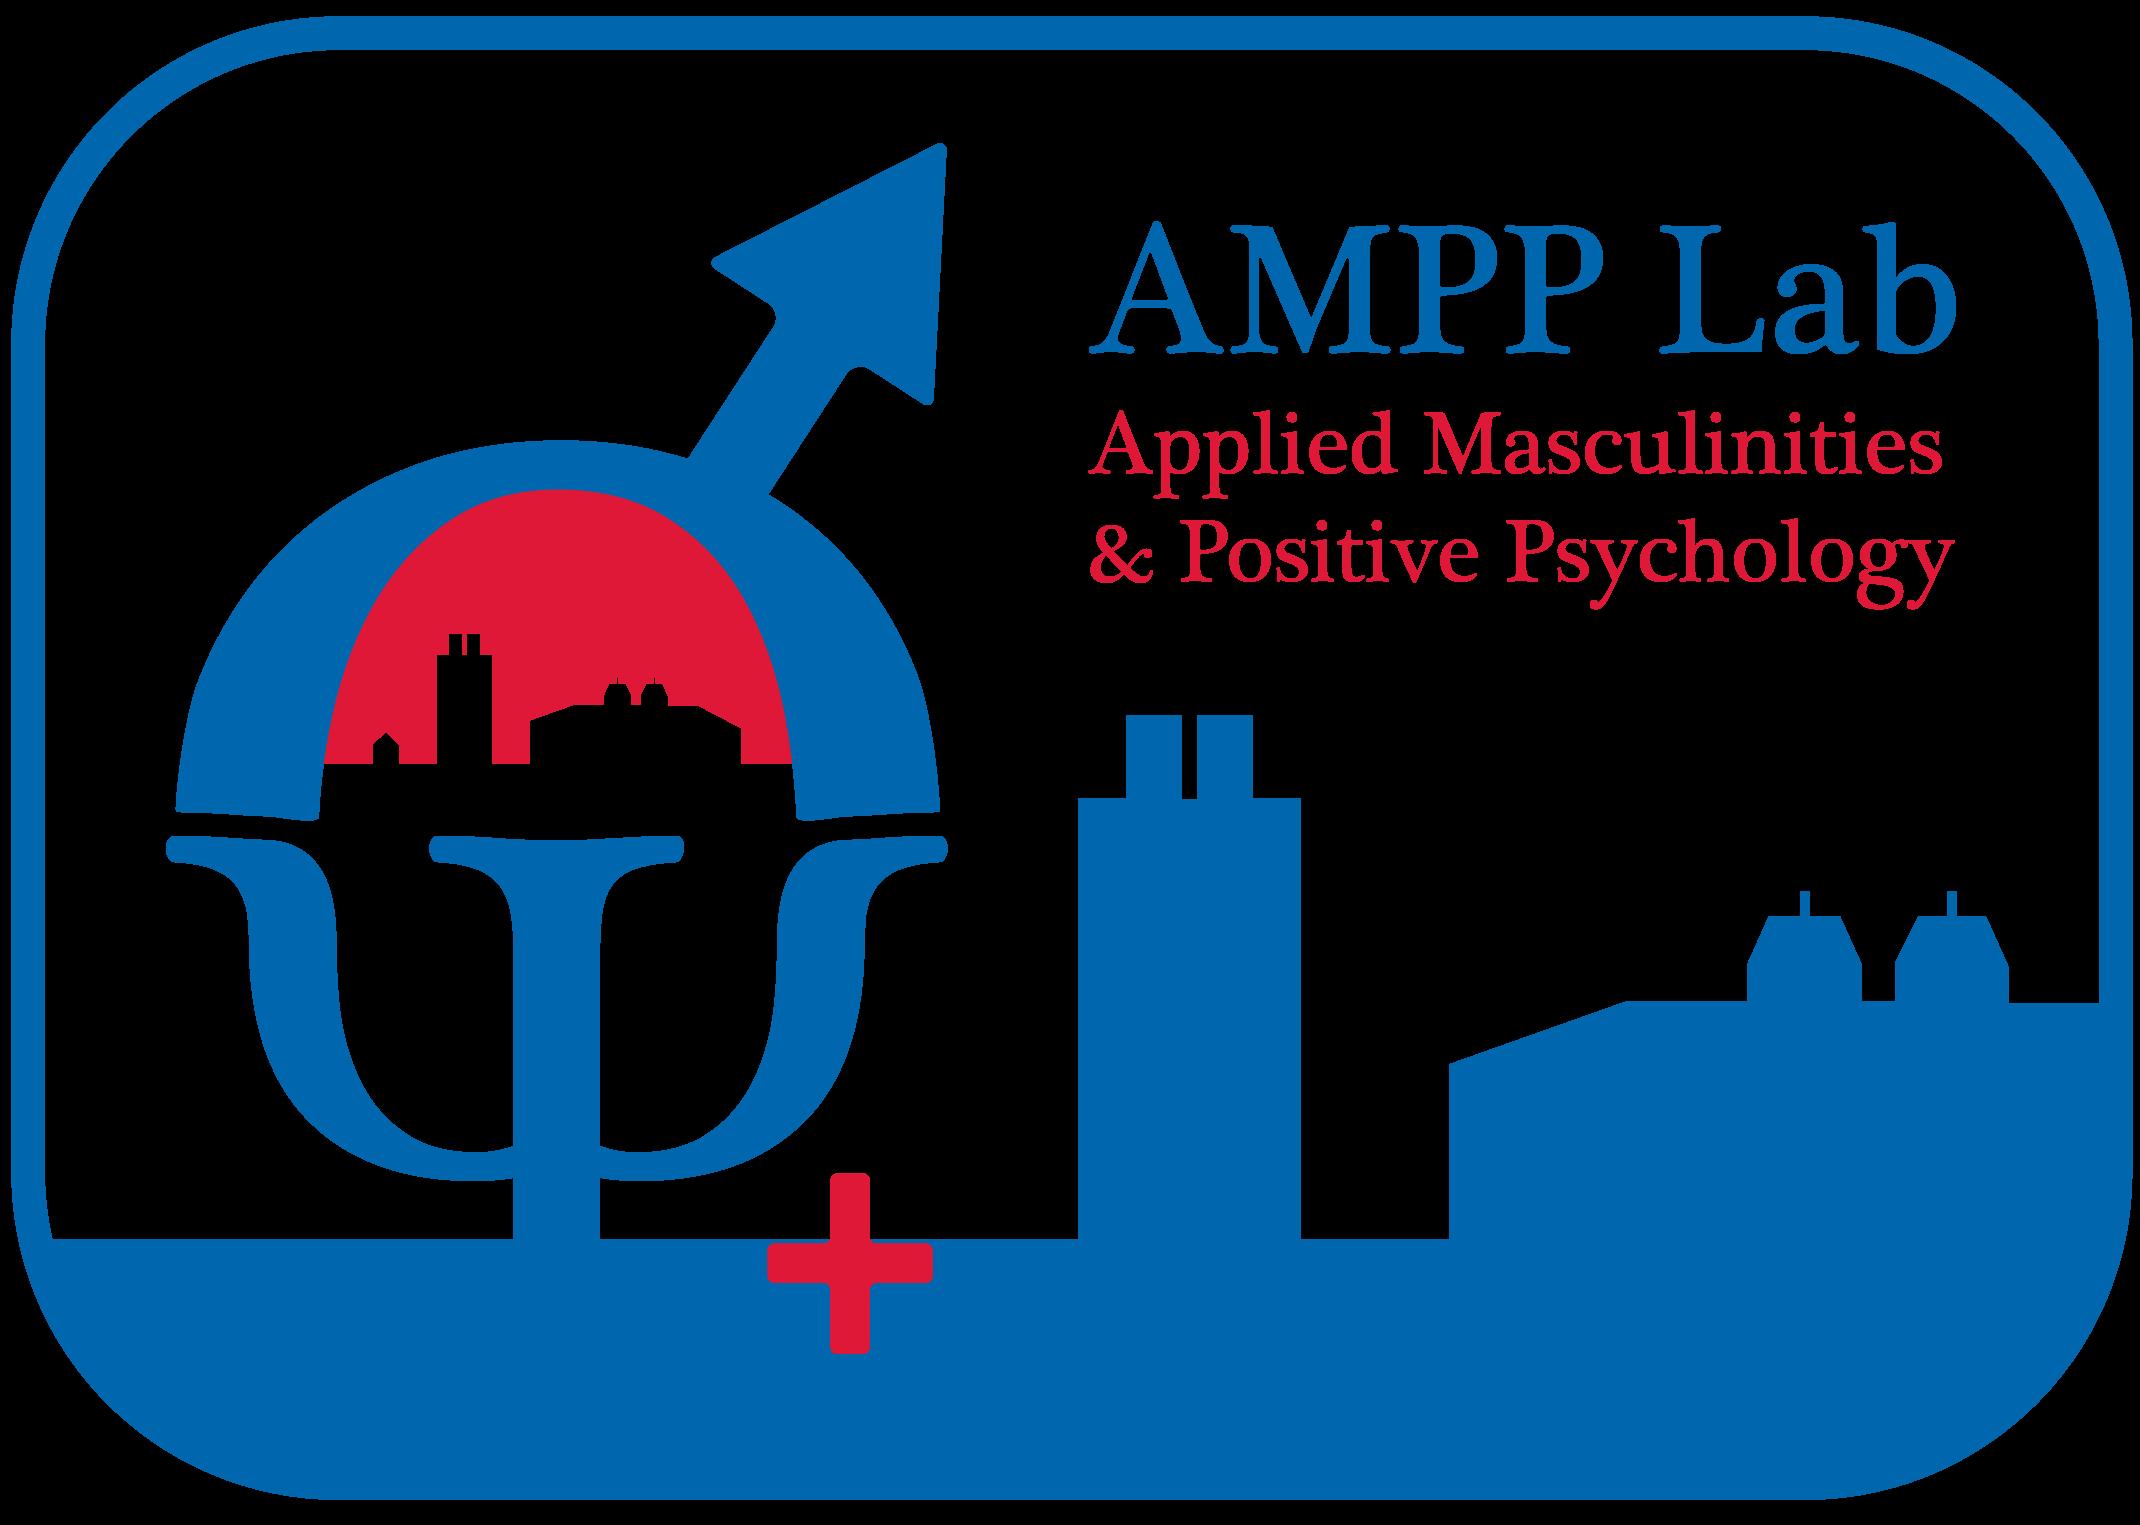 AMPP Lab